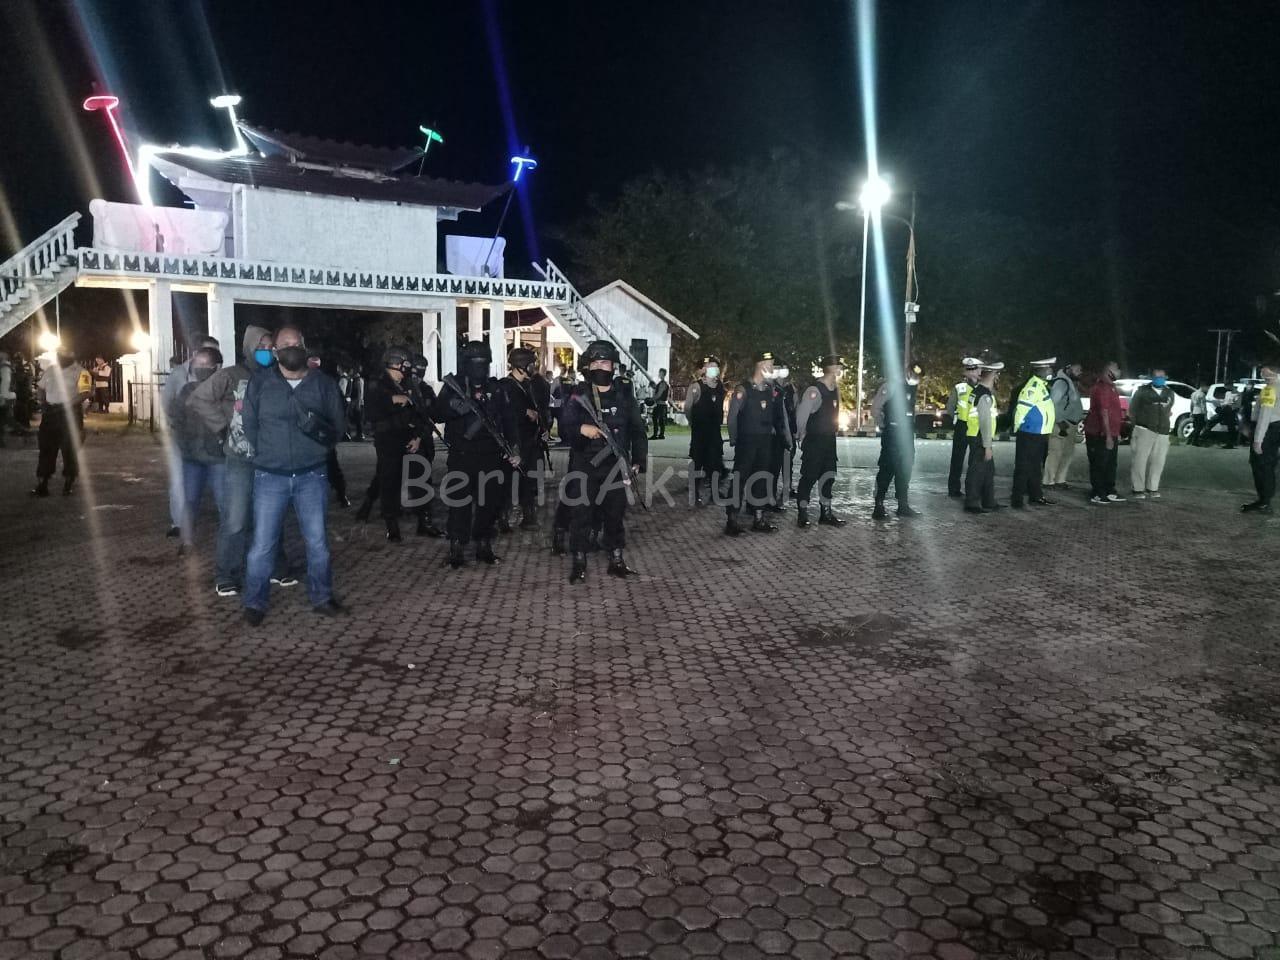 Polda PB Siapkan 317 Personil Buru Pelaku Kejahatan di Manokwari 3 IMG 20200426 WA0060